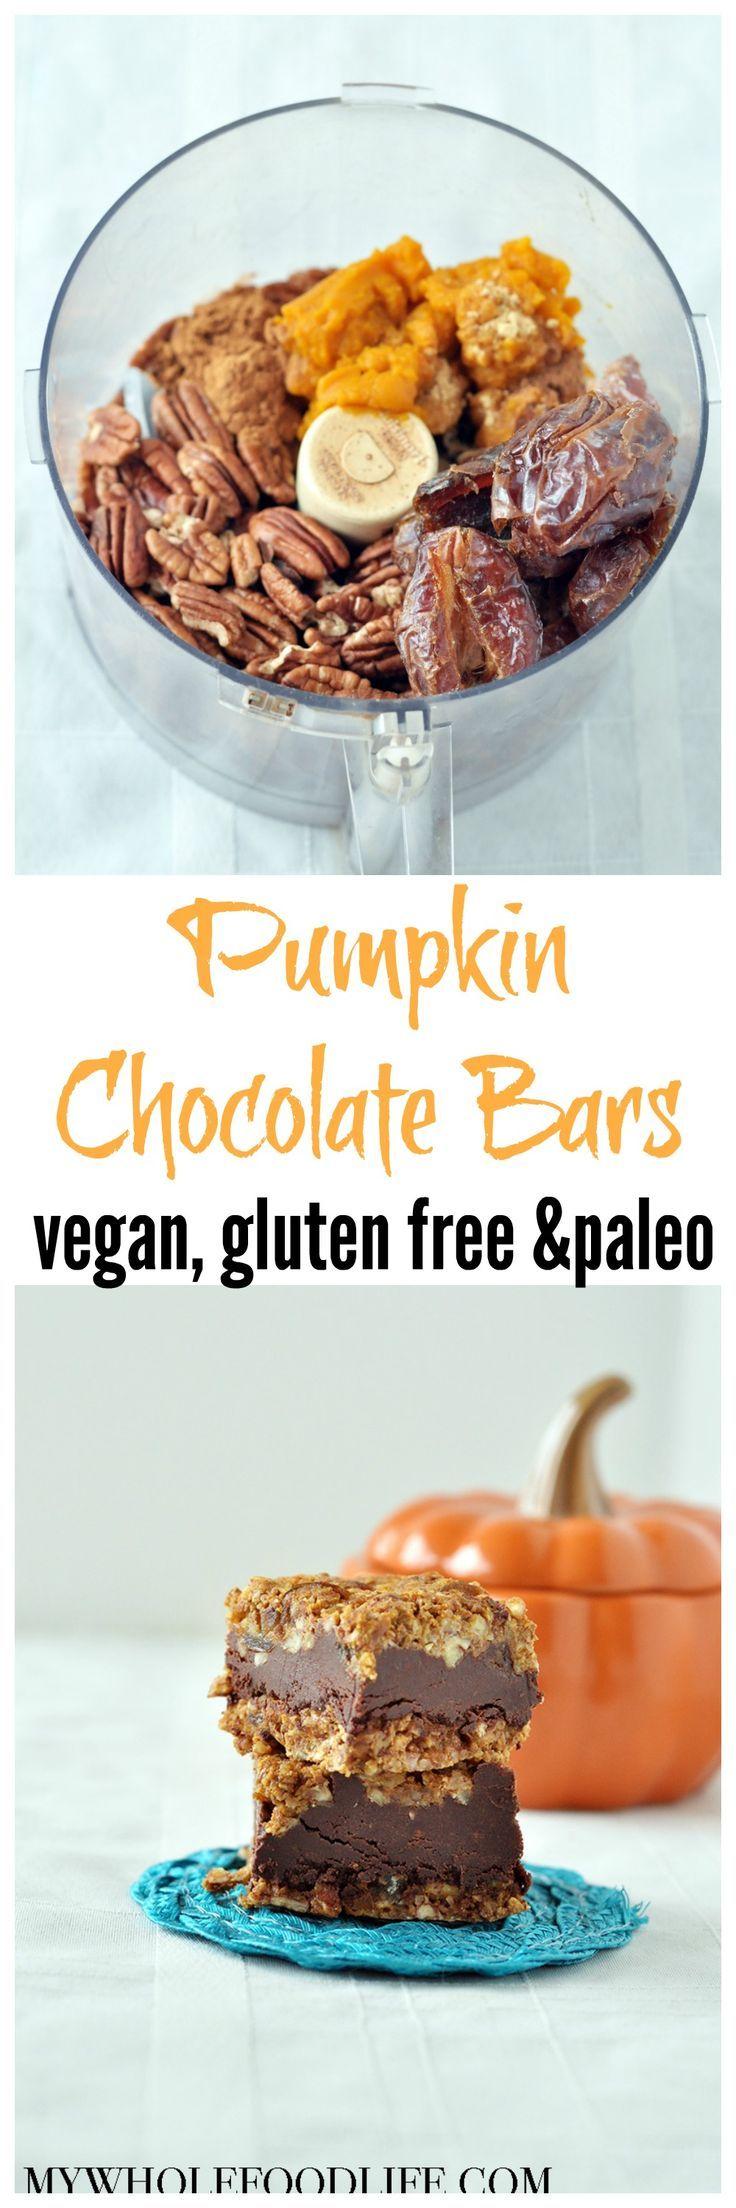 Paleo Vegan Pumpkin Chocolate Bars Glutenfree My Whole Food